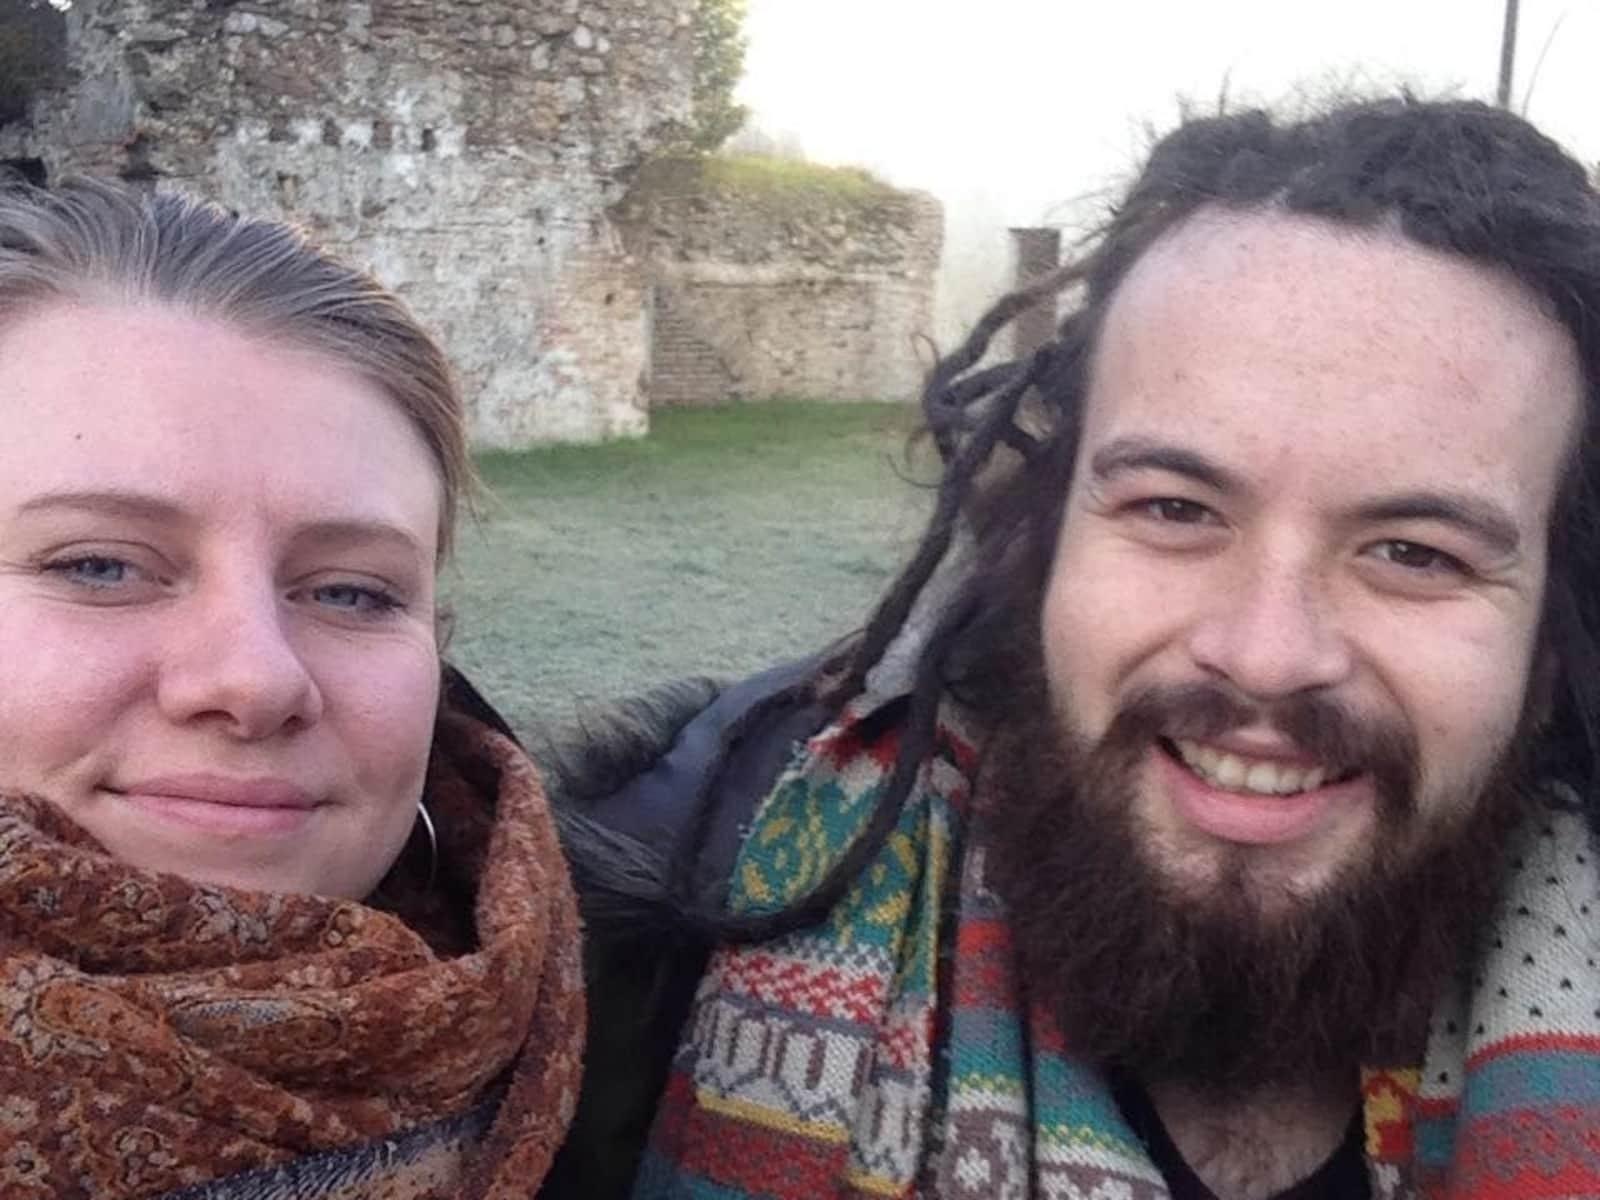 Jordan & Layton from Hobart, Tasmania, Australia